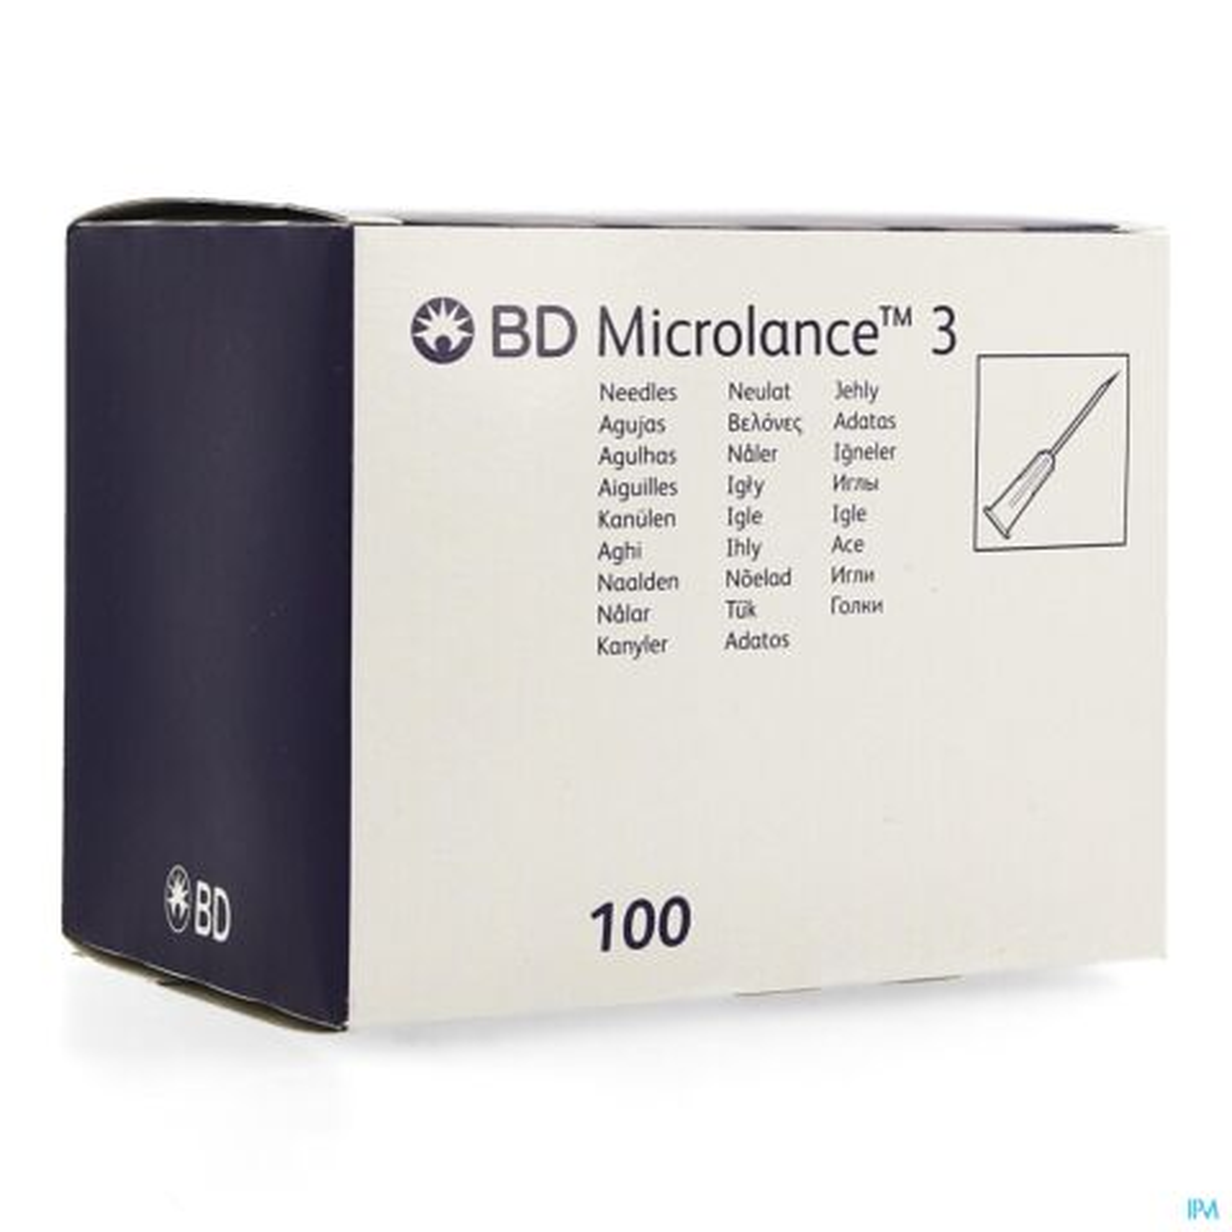 BD MICROLANCE 3 NAALD 22G 1 1/4 RB 0,7X30MM ZWT 1